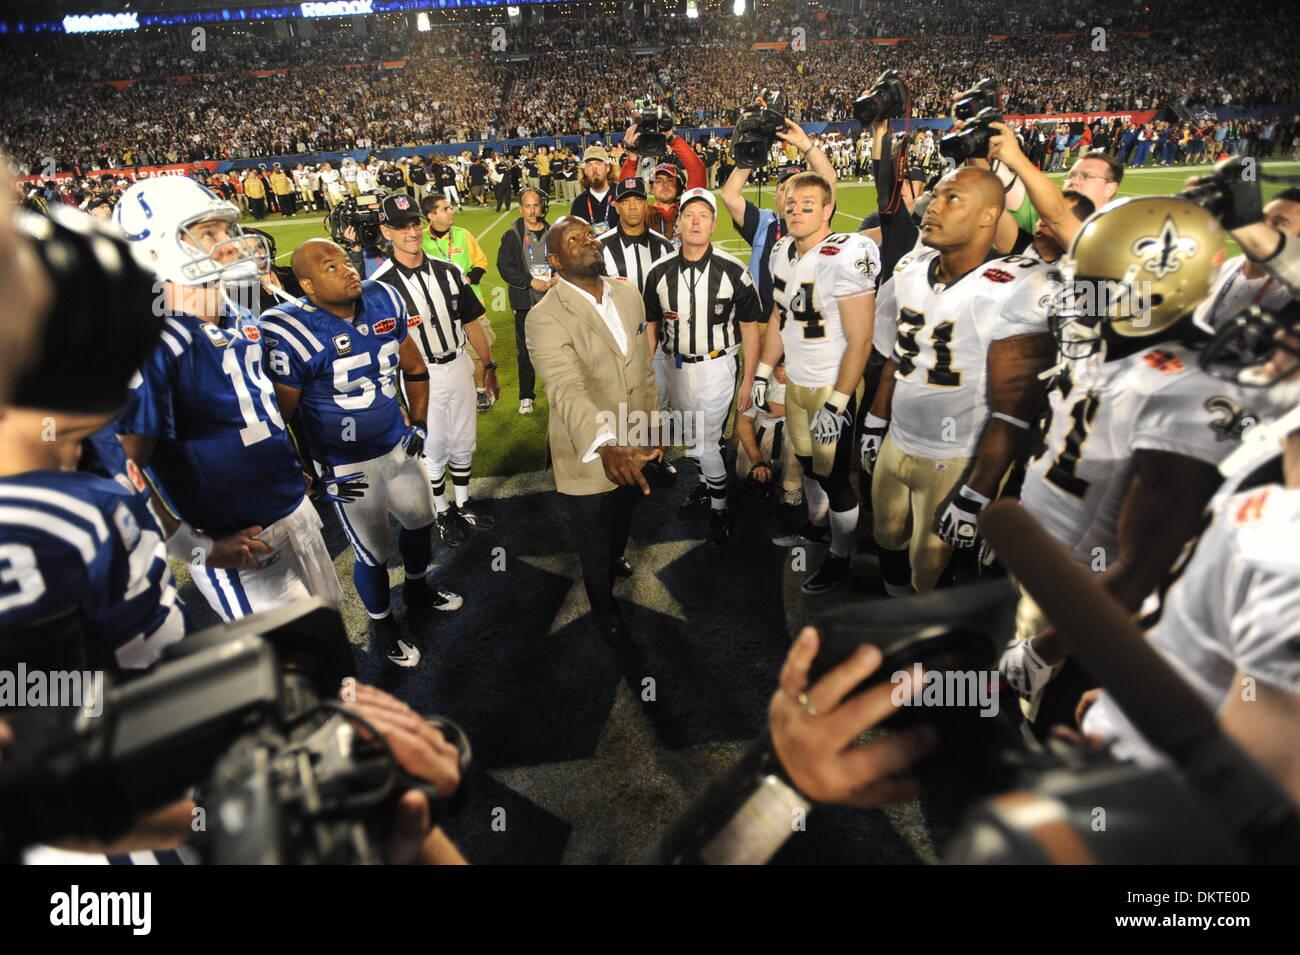 Feb. 07, 2010 - Miami Gardens, Florida, USA - University of Florida alumni and NFL star EMMETT SMIITH does the coin flip at the start of Super Bowl XLIV at Sun Life Stadium. (Credit Image: © Jim Rassol/Sun-Sentinel/ZUMApress.com) - Stock Image